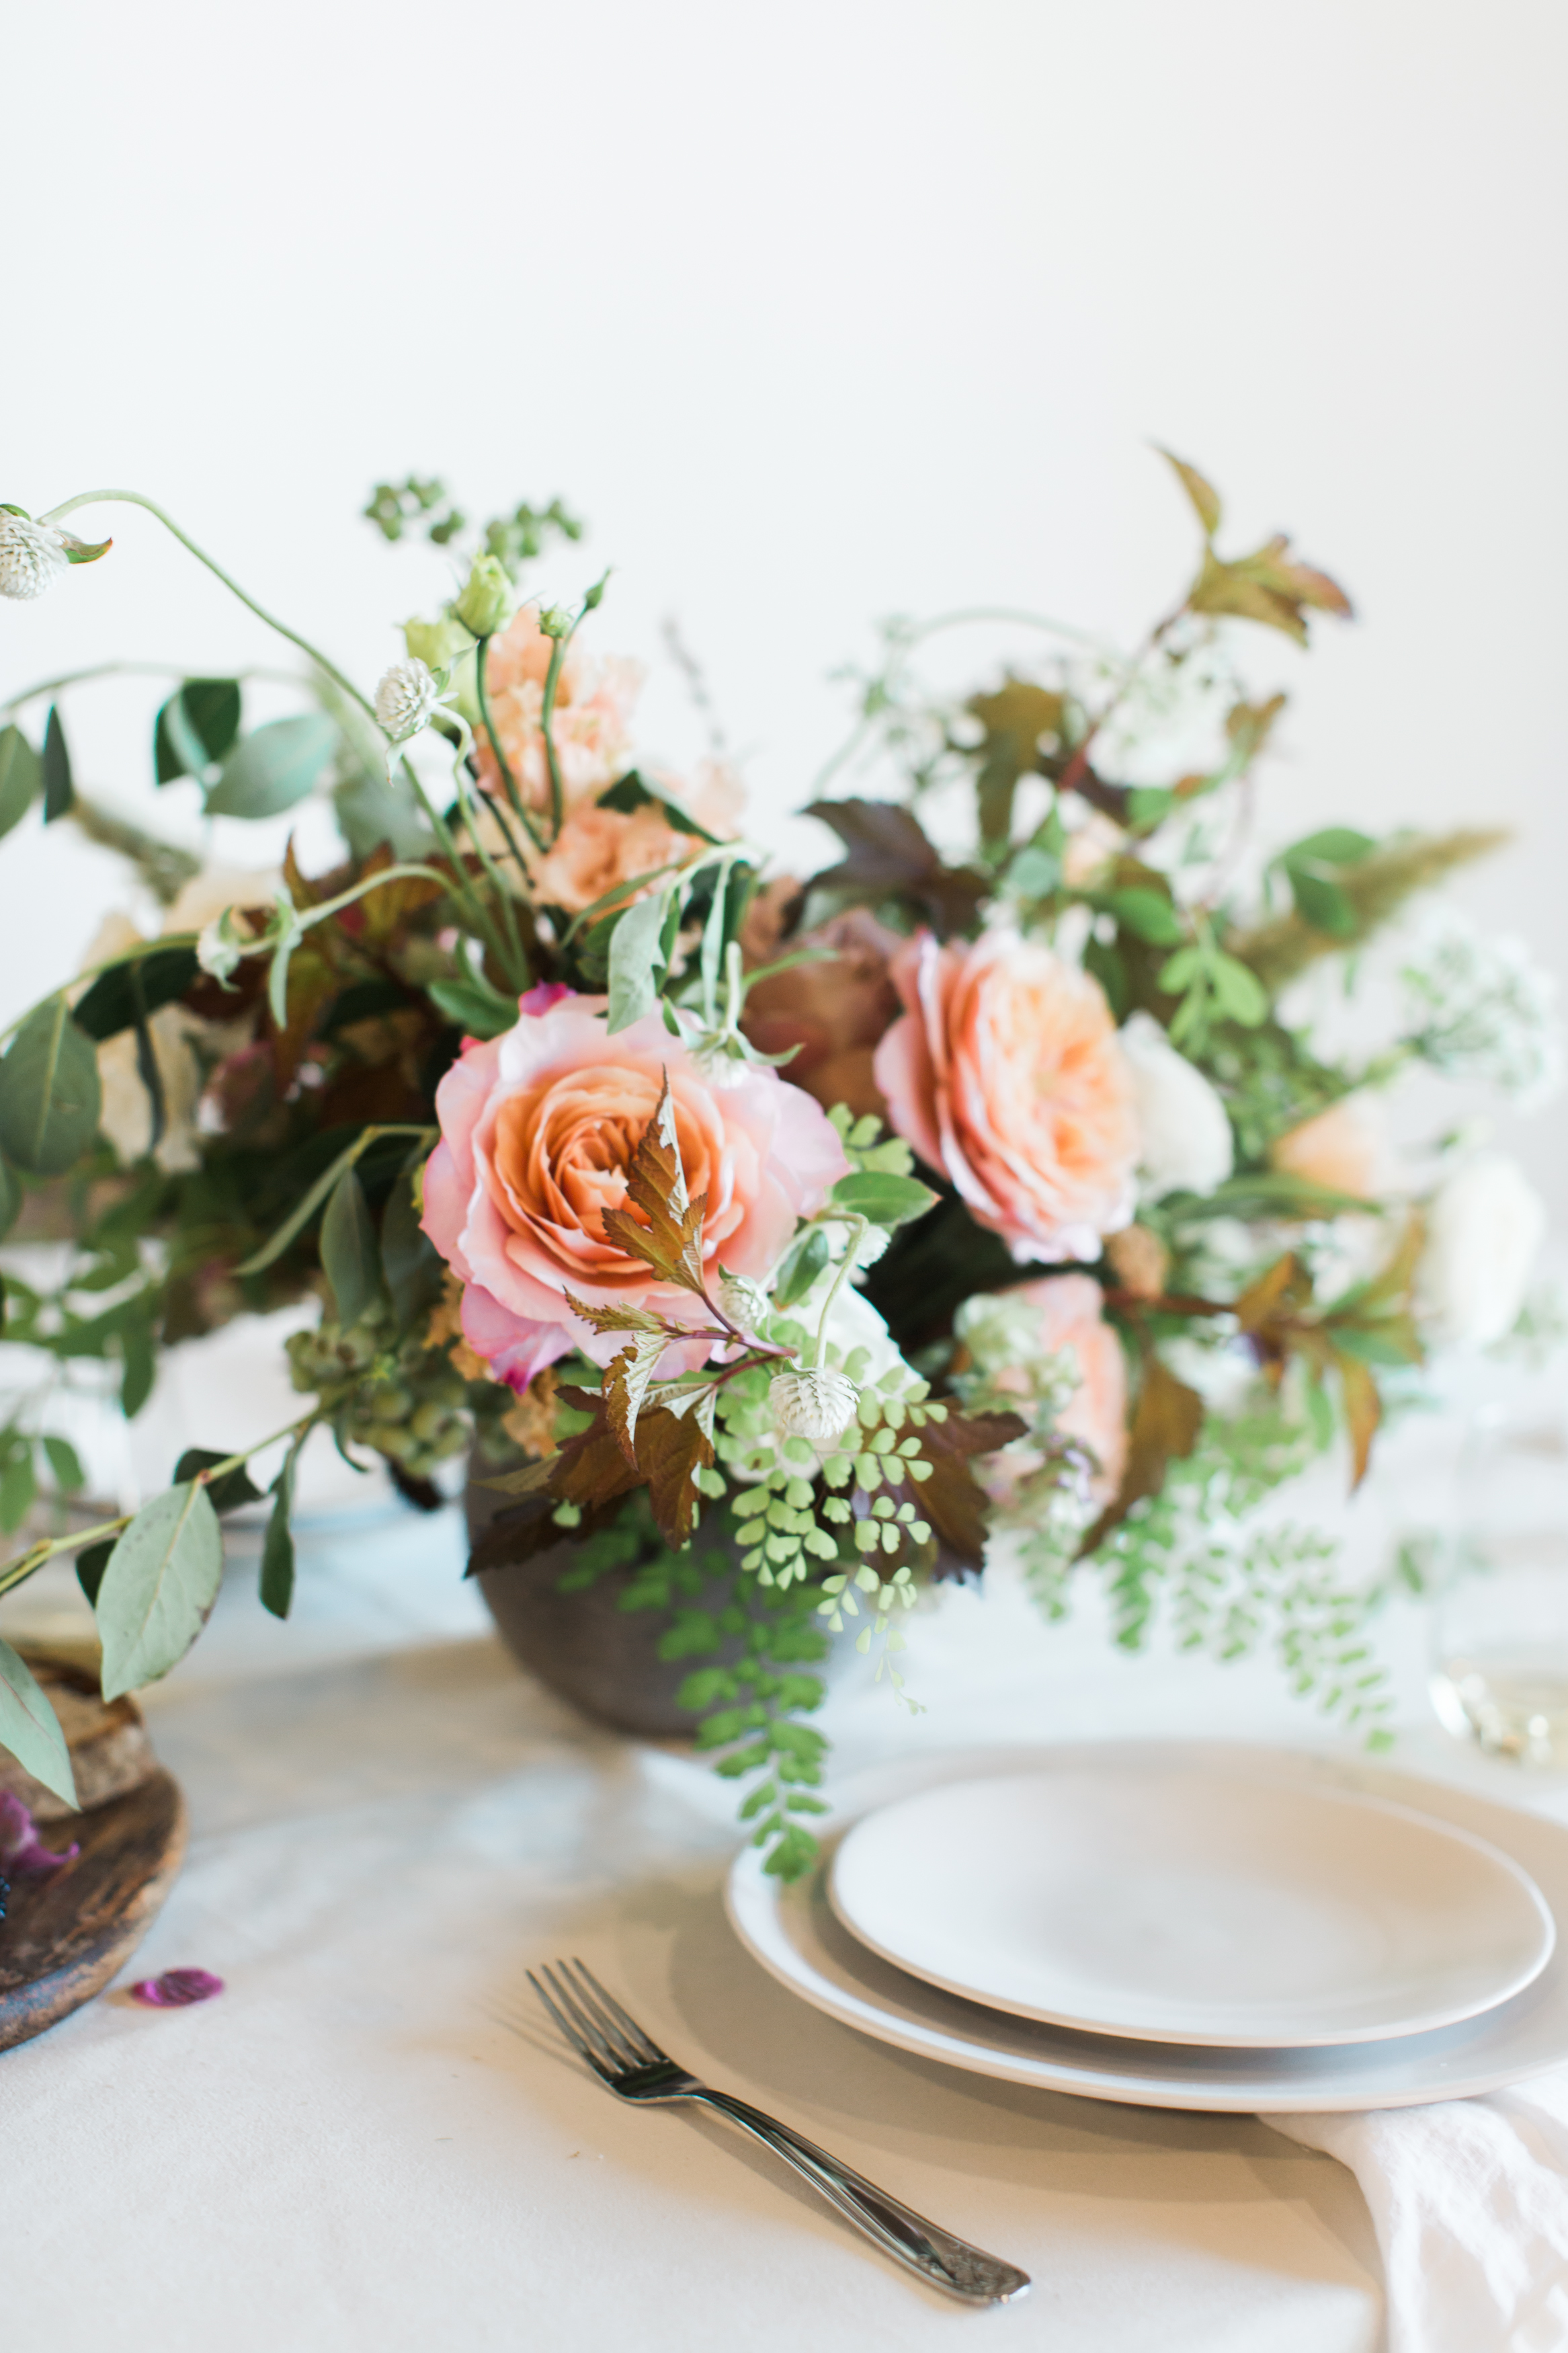 ashley-eileen-floral-design2.jpg